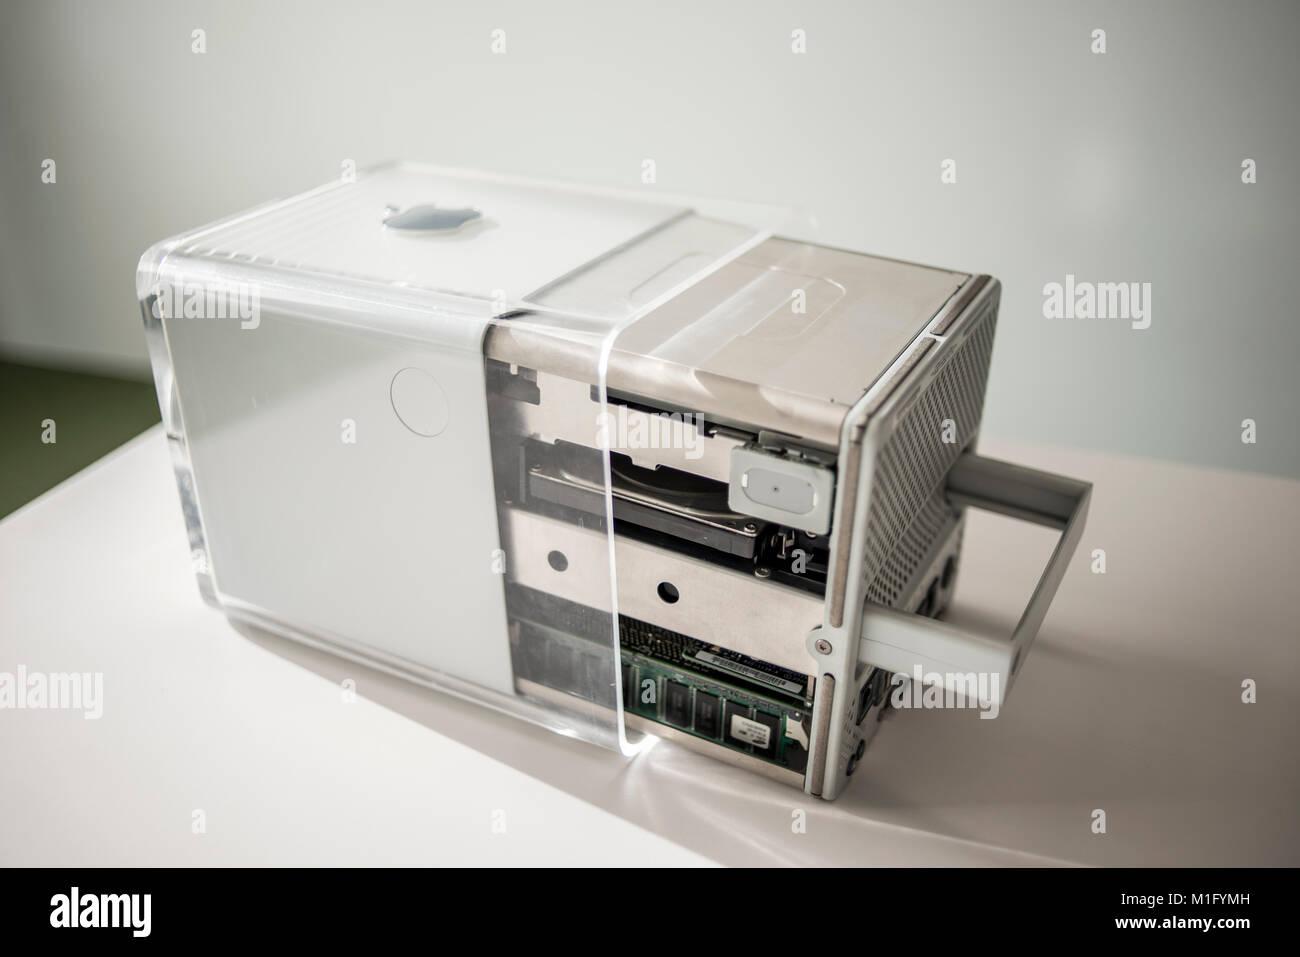 Power mac g4 cube date de sortie juillet 2000 exposé au musée de